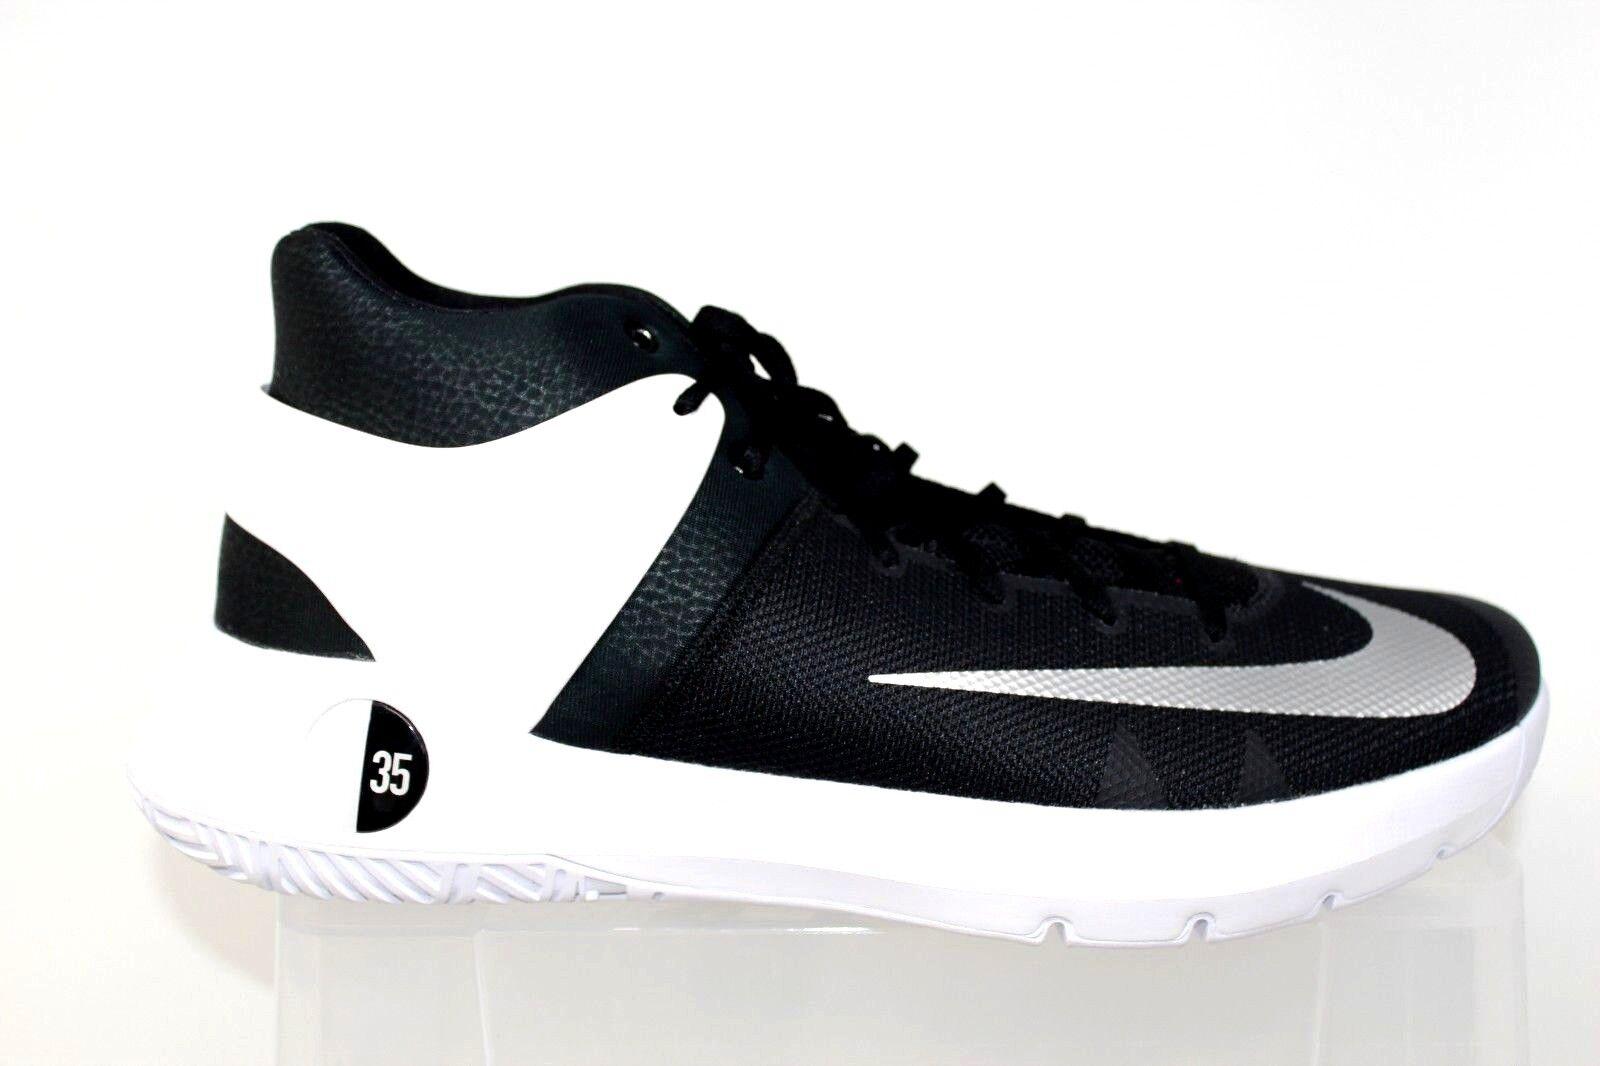 Nike KD Trey 5 IV Promo Basketball Basketball Basketball Kevin Durant Black White Sz 18 c2e215